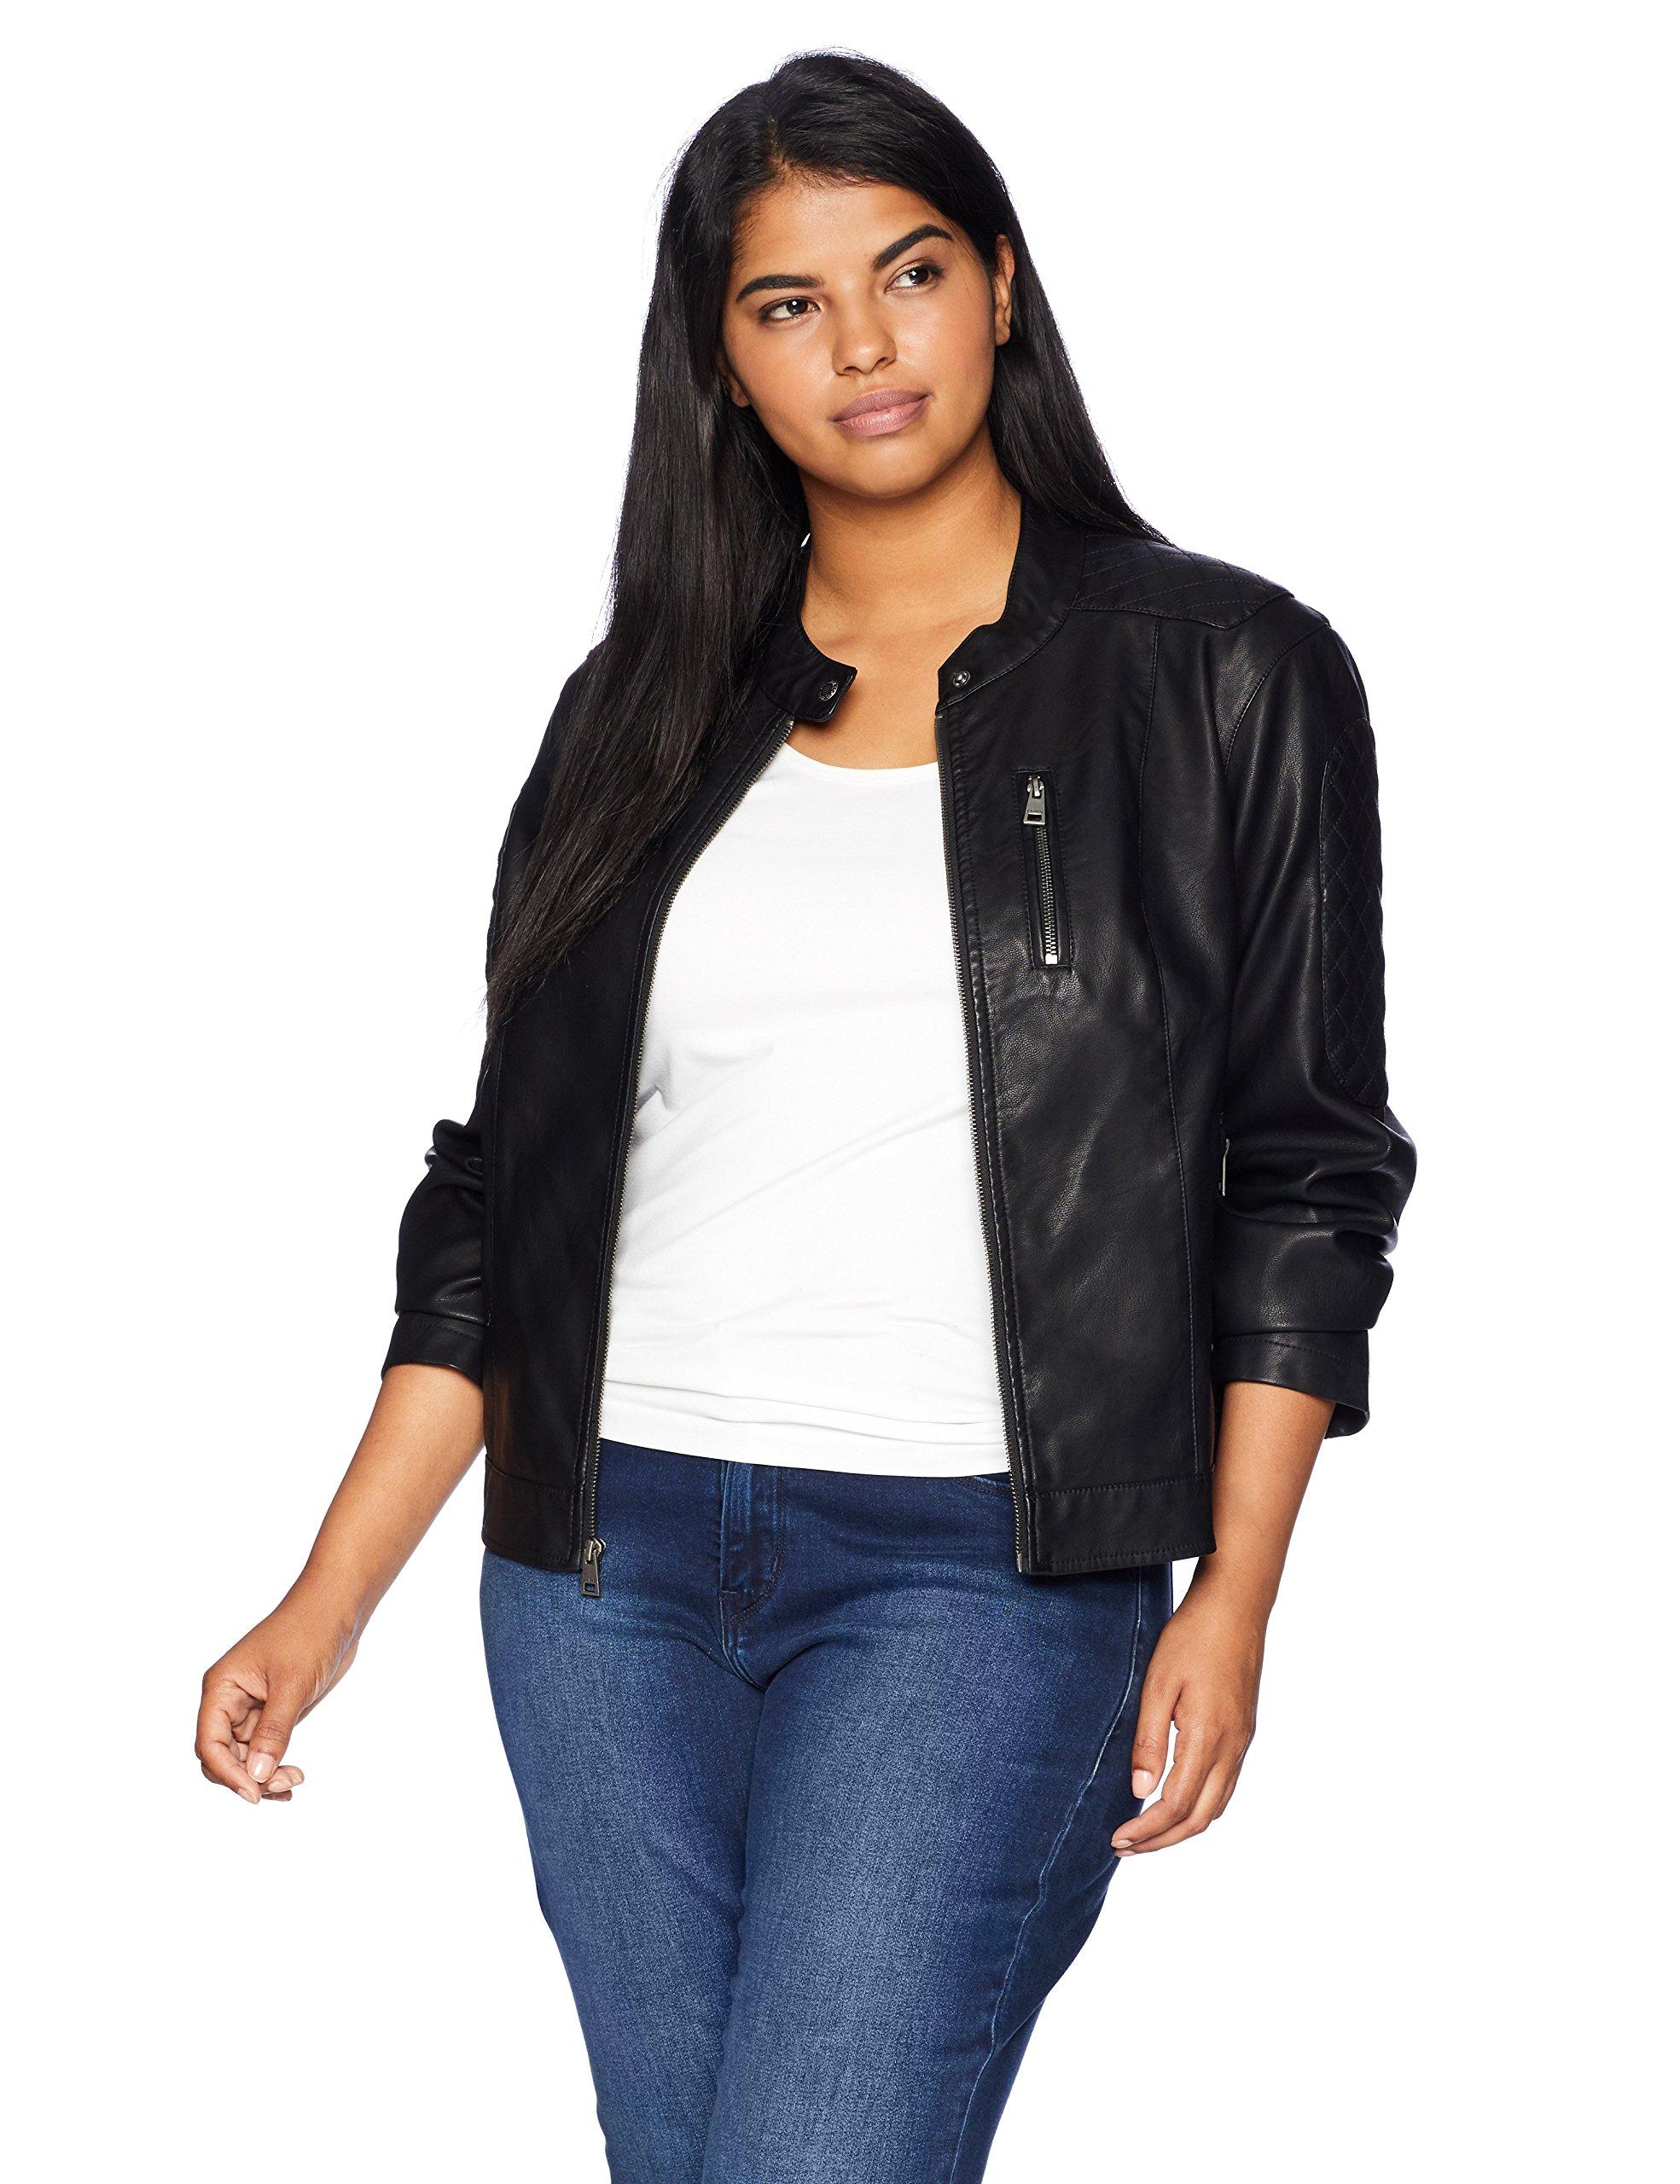 Levi's Size Women's Plus Faux Leather Fashion Quilted Racer Jacket, Black, 3X